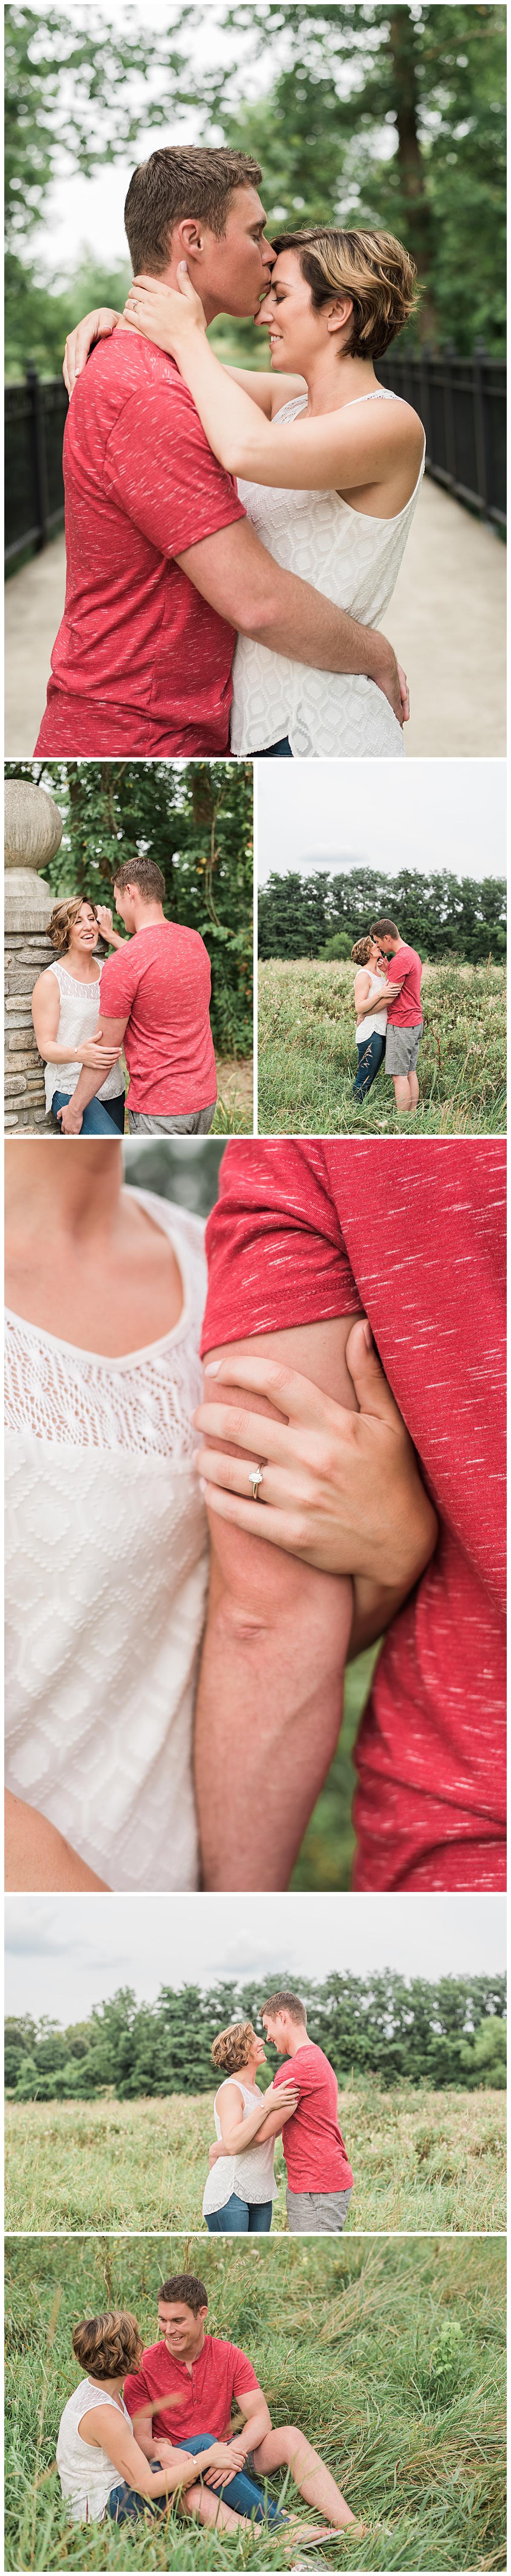 jamie and dave's engagement glenwood gardens cincinnati ohio